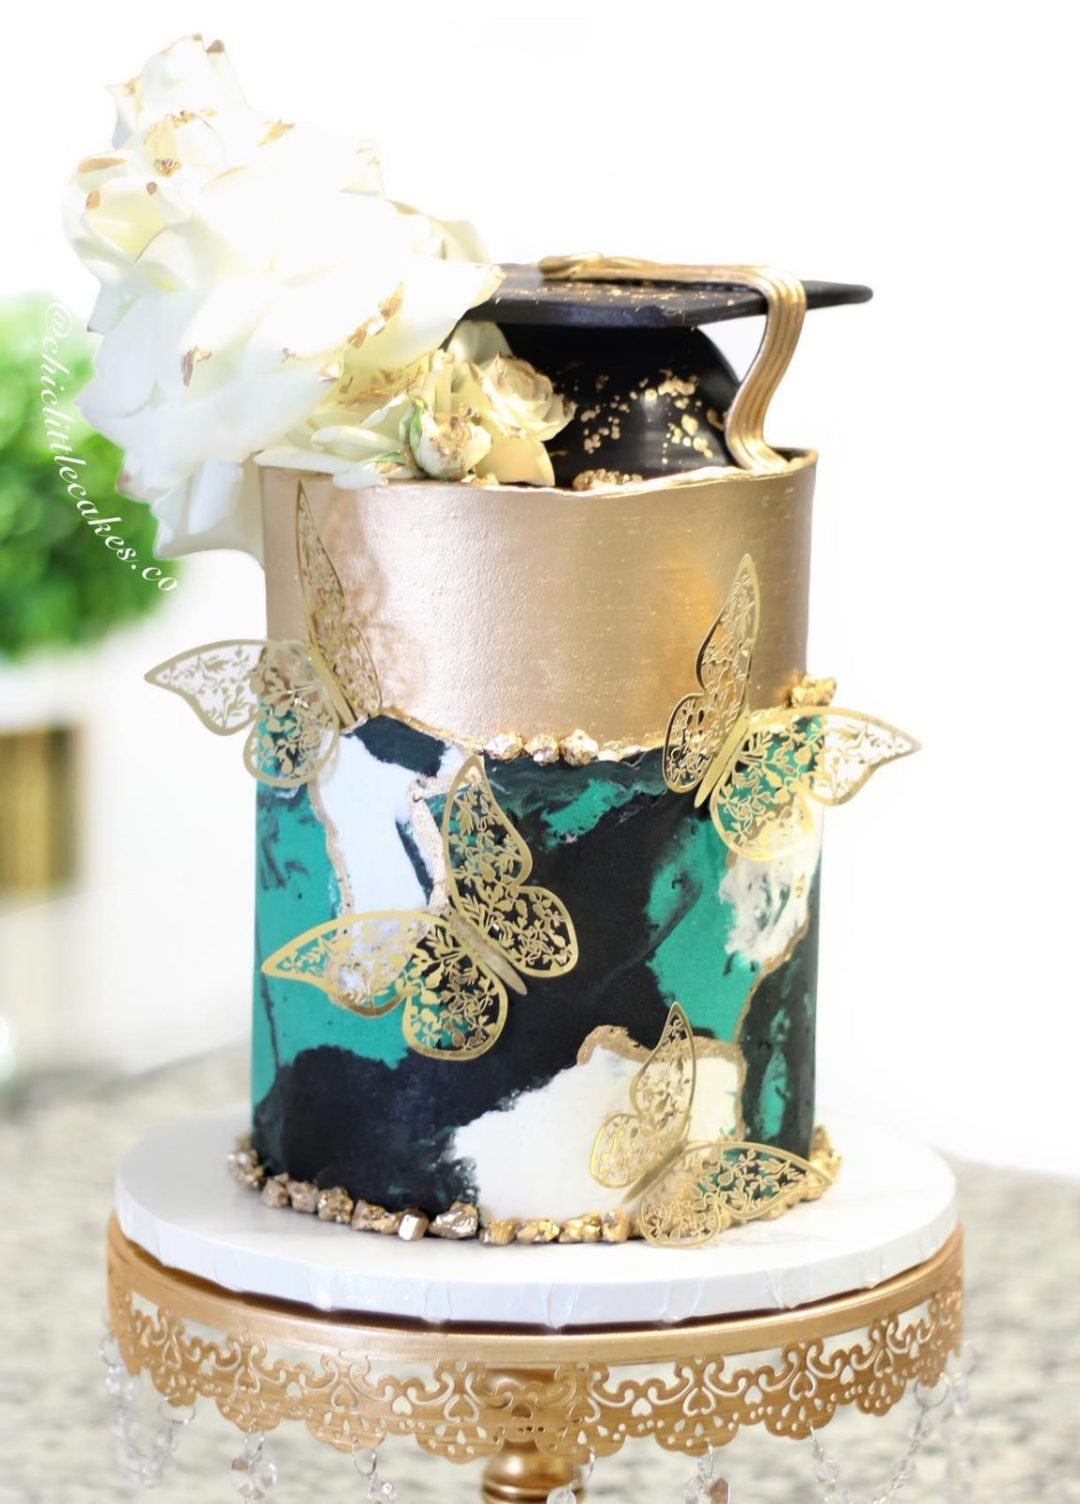 Gold graduation cake with butterflies